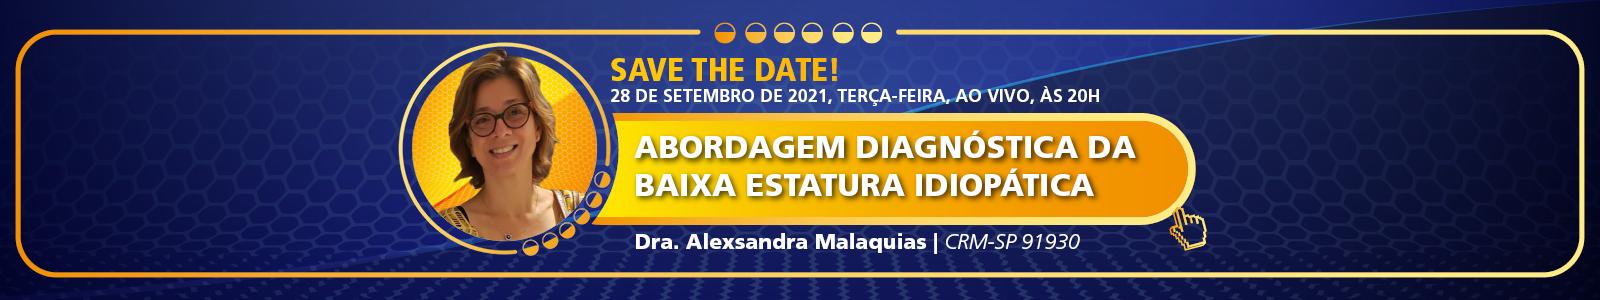 Academia Endocrino-Banner 1600X300-Doutora-Alexsandra-Malaquias-Save-the Date!